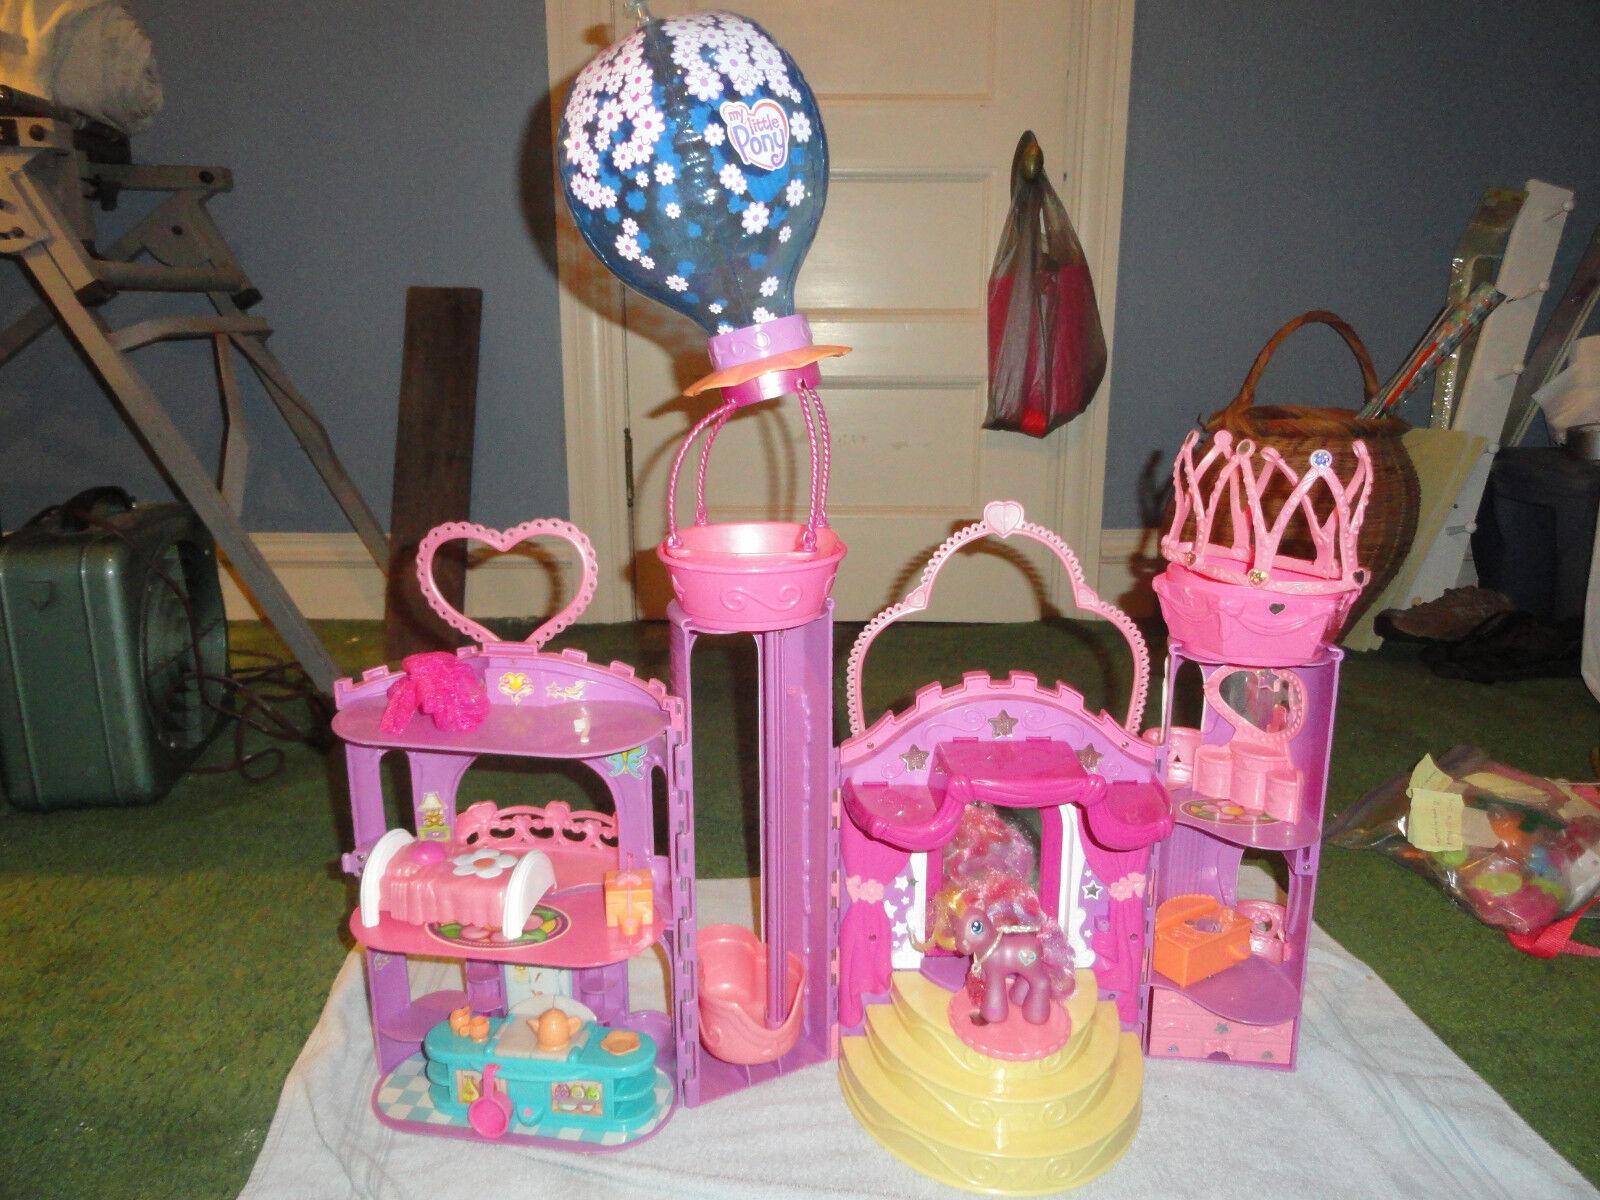 Pony Celebration Castle con My Little Sunsparkle 2003 Sonidos Y Luces En Funcionamiento